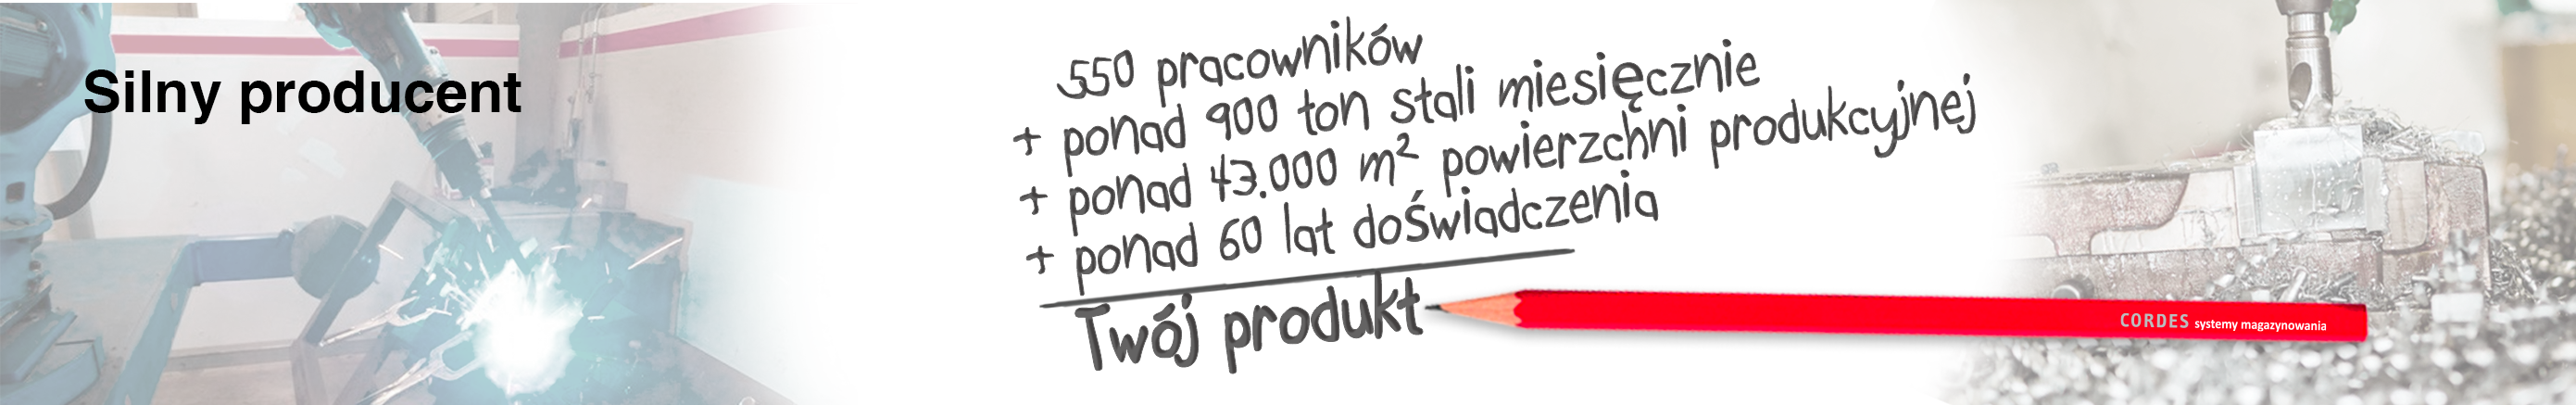 Starker-Hersteller-pl